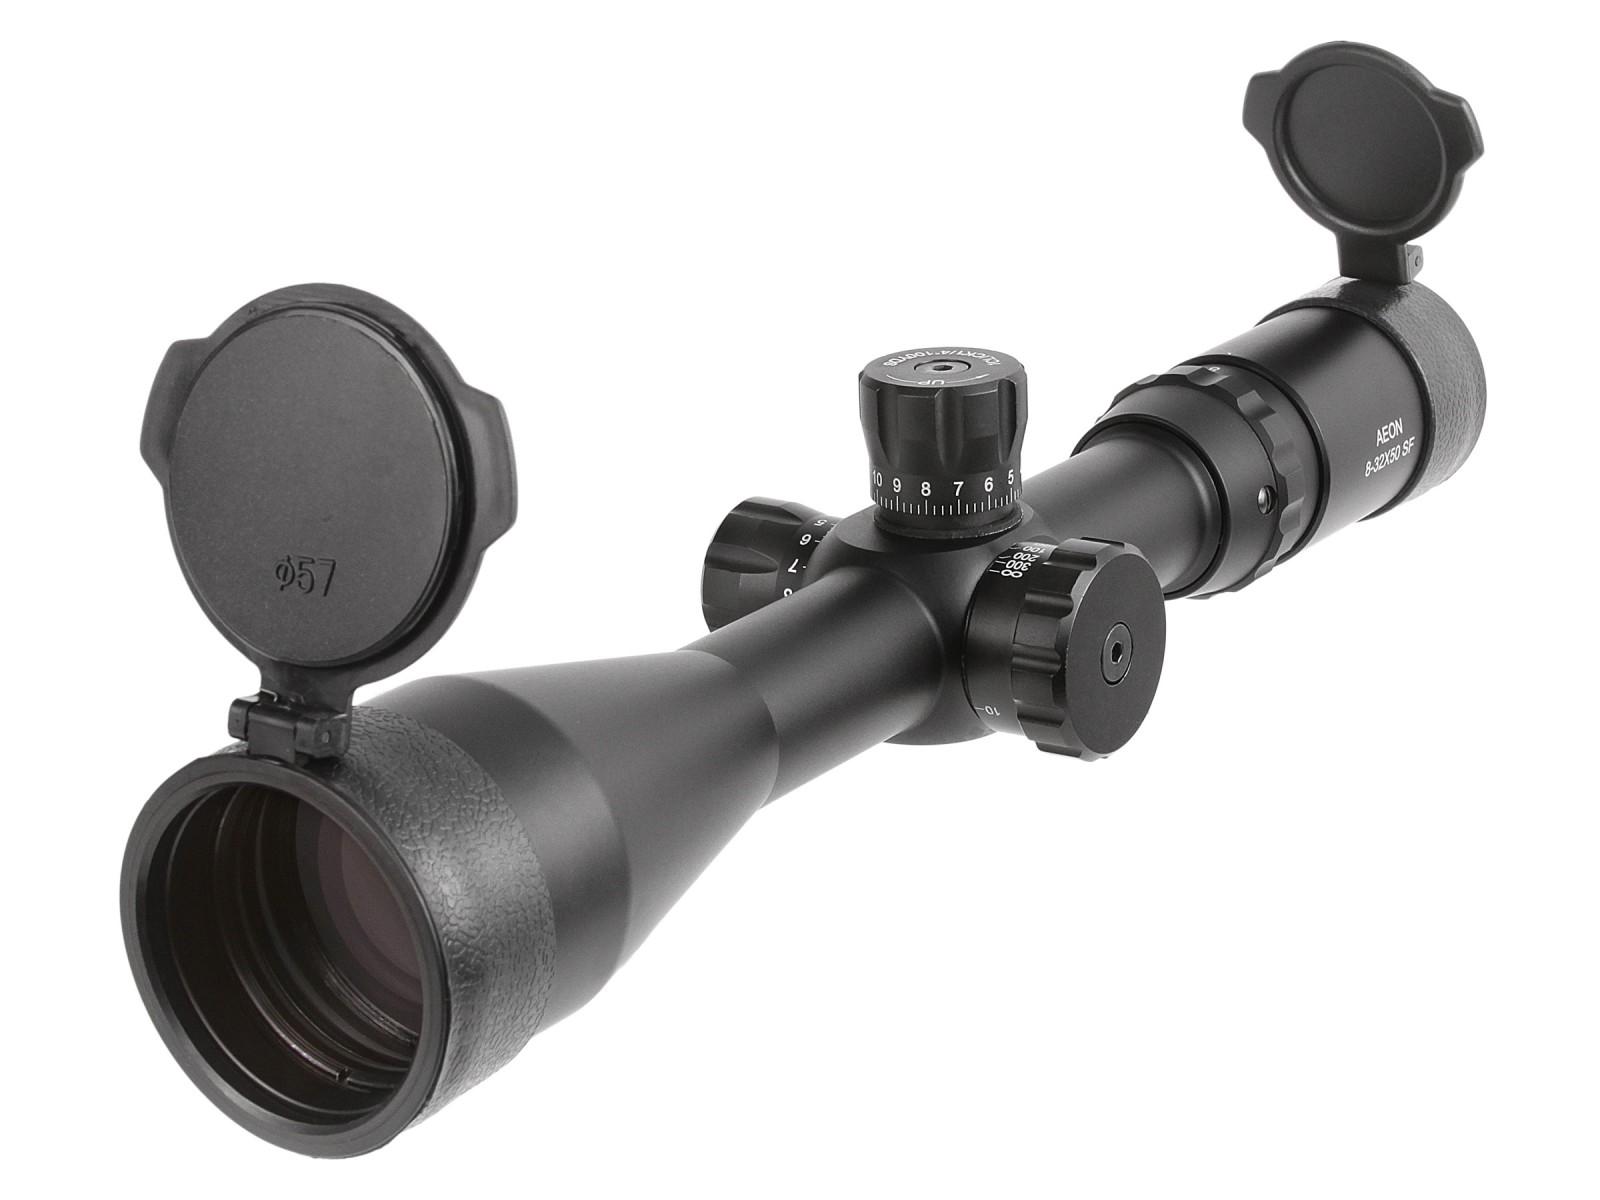 Aeon 8-32x50 AO Classic Rifle Scope, Trajectory Reticle, 1/4 MOA, 30mm Tube